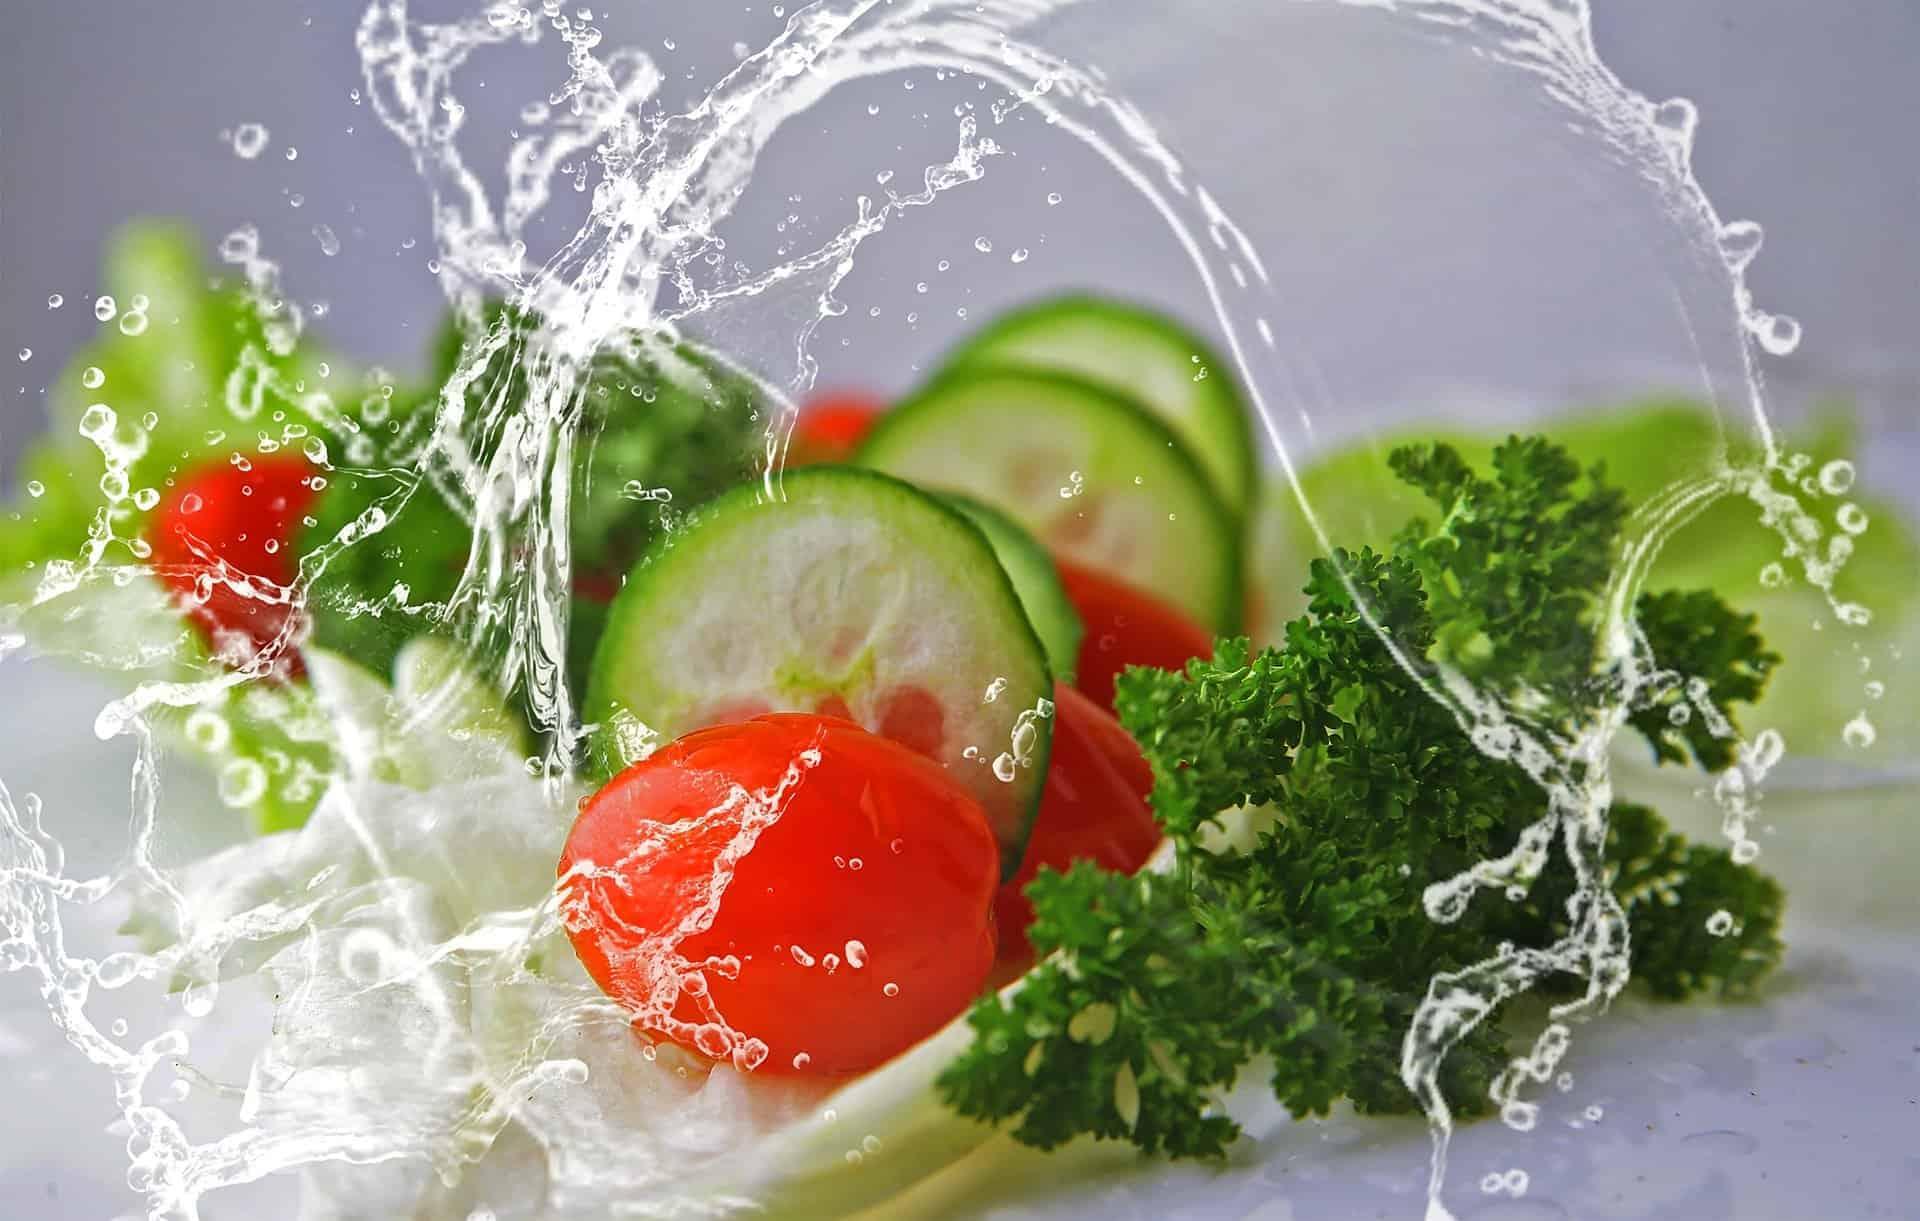 Vegetables splashed in water